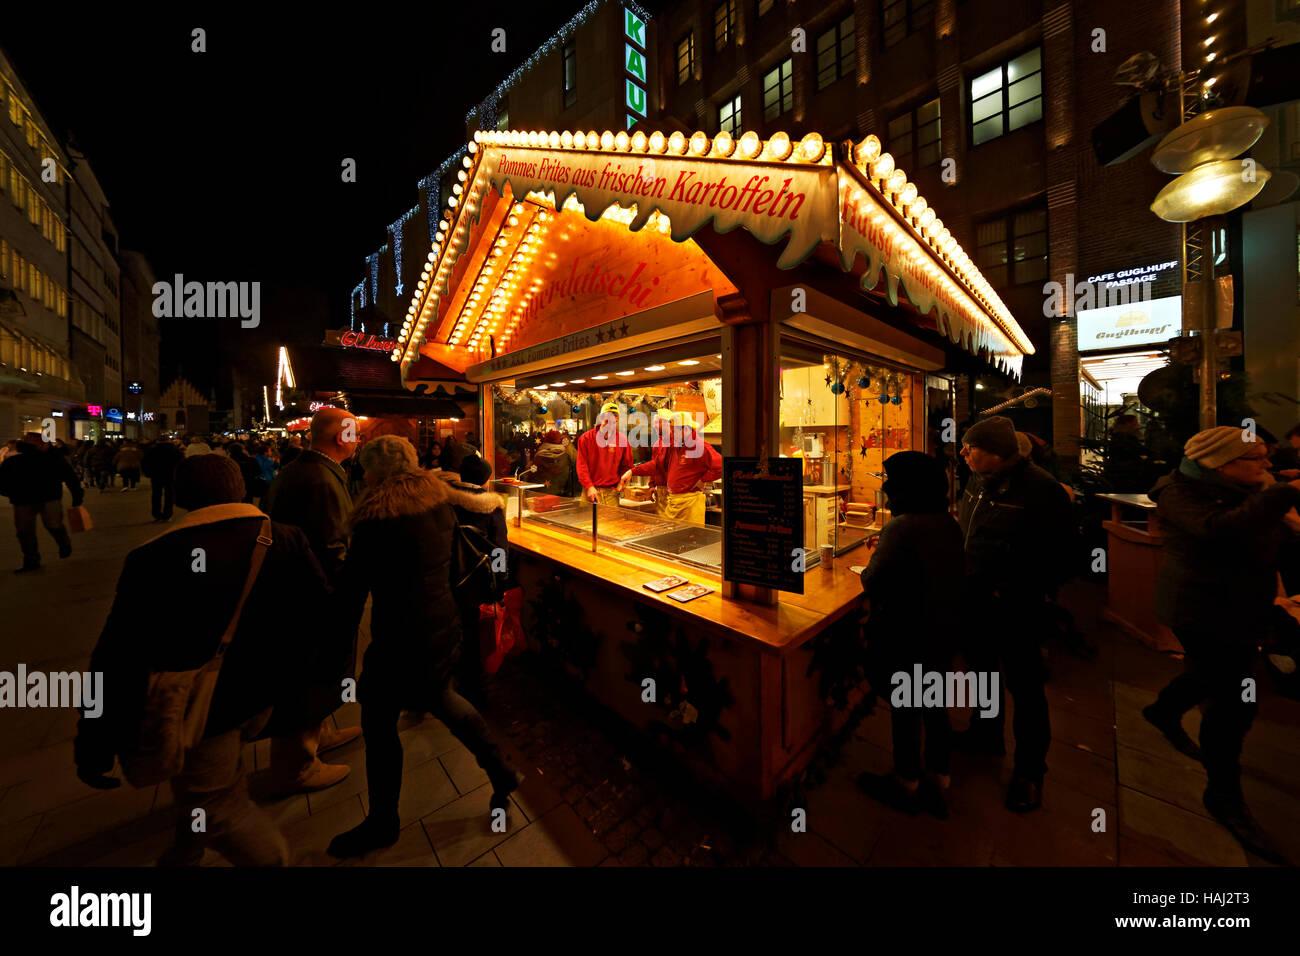 German Christmas markets, Munich, Upper Bavaria, Germany, Europe - Stock Image